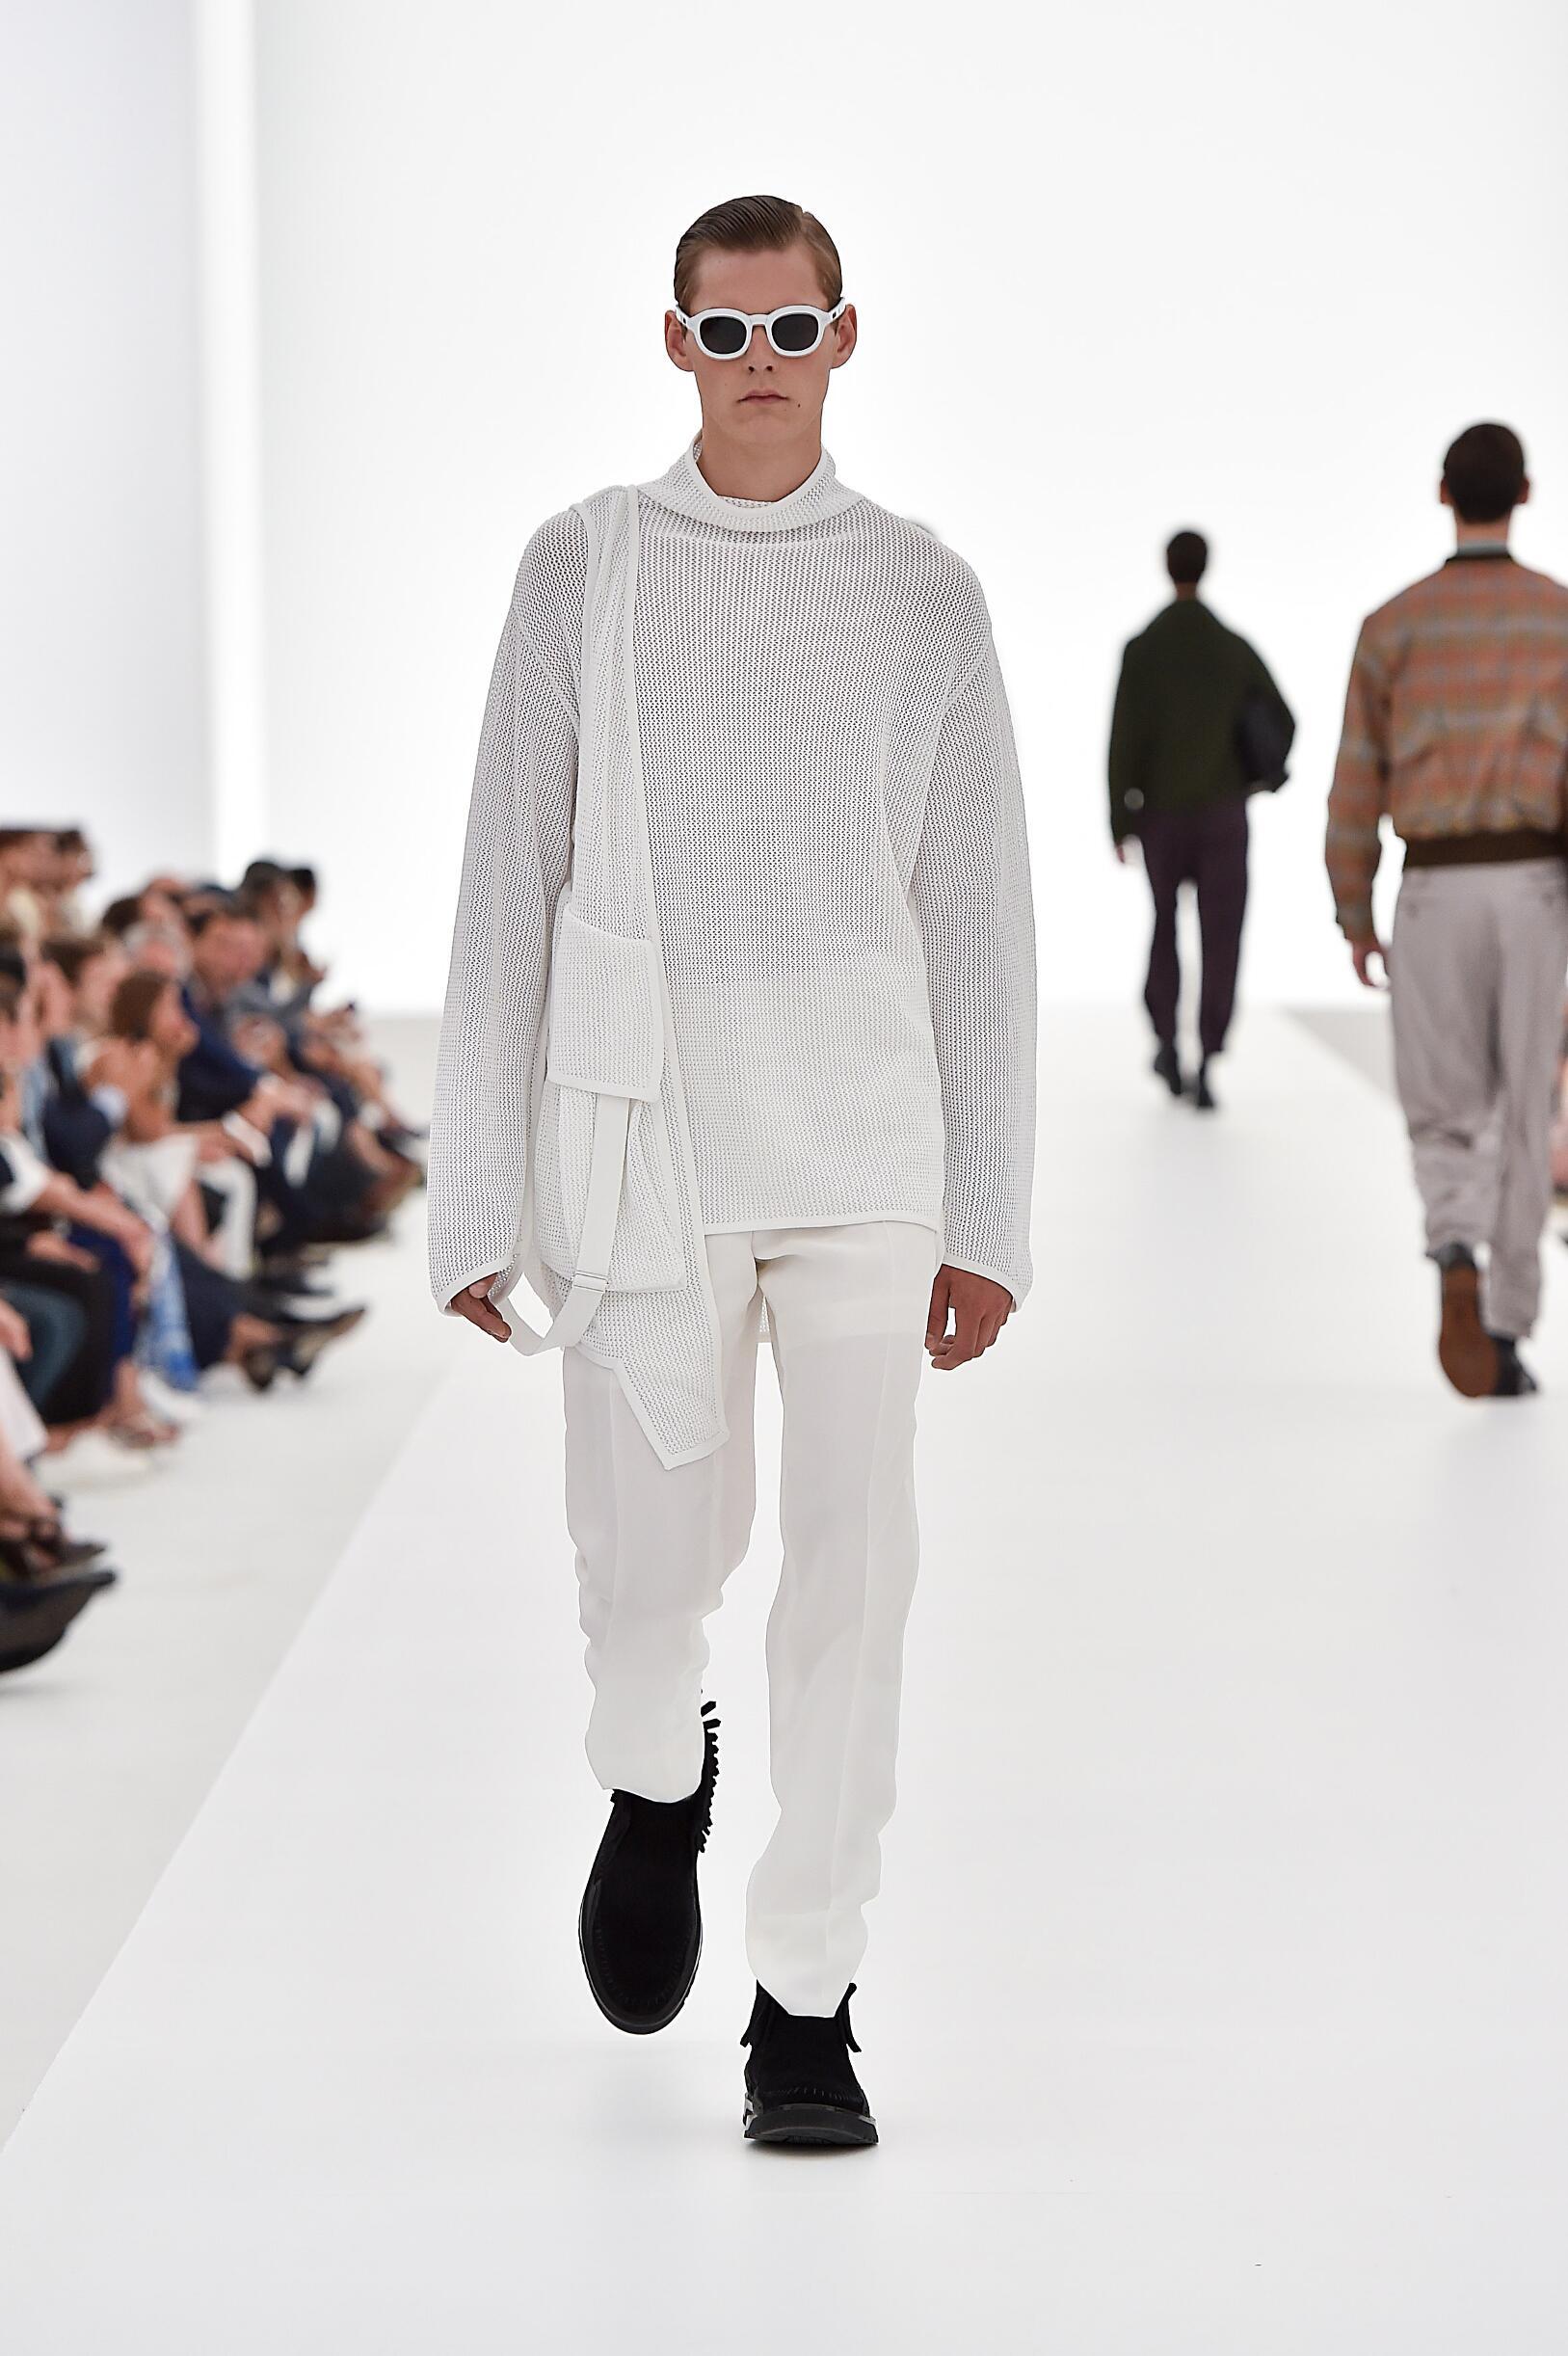 Catwalk Ermenegildo Zegna Couture Spring Summer 2016 Men's Collection Milan Fashion Week